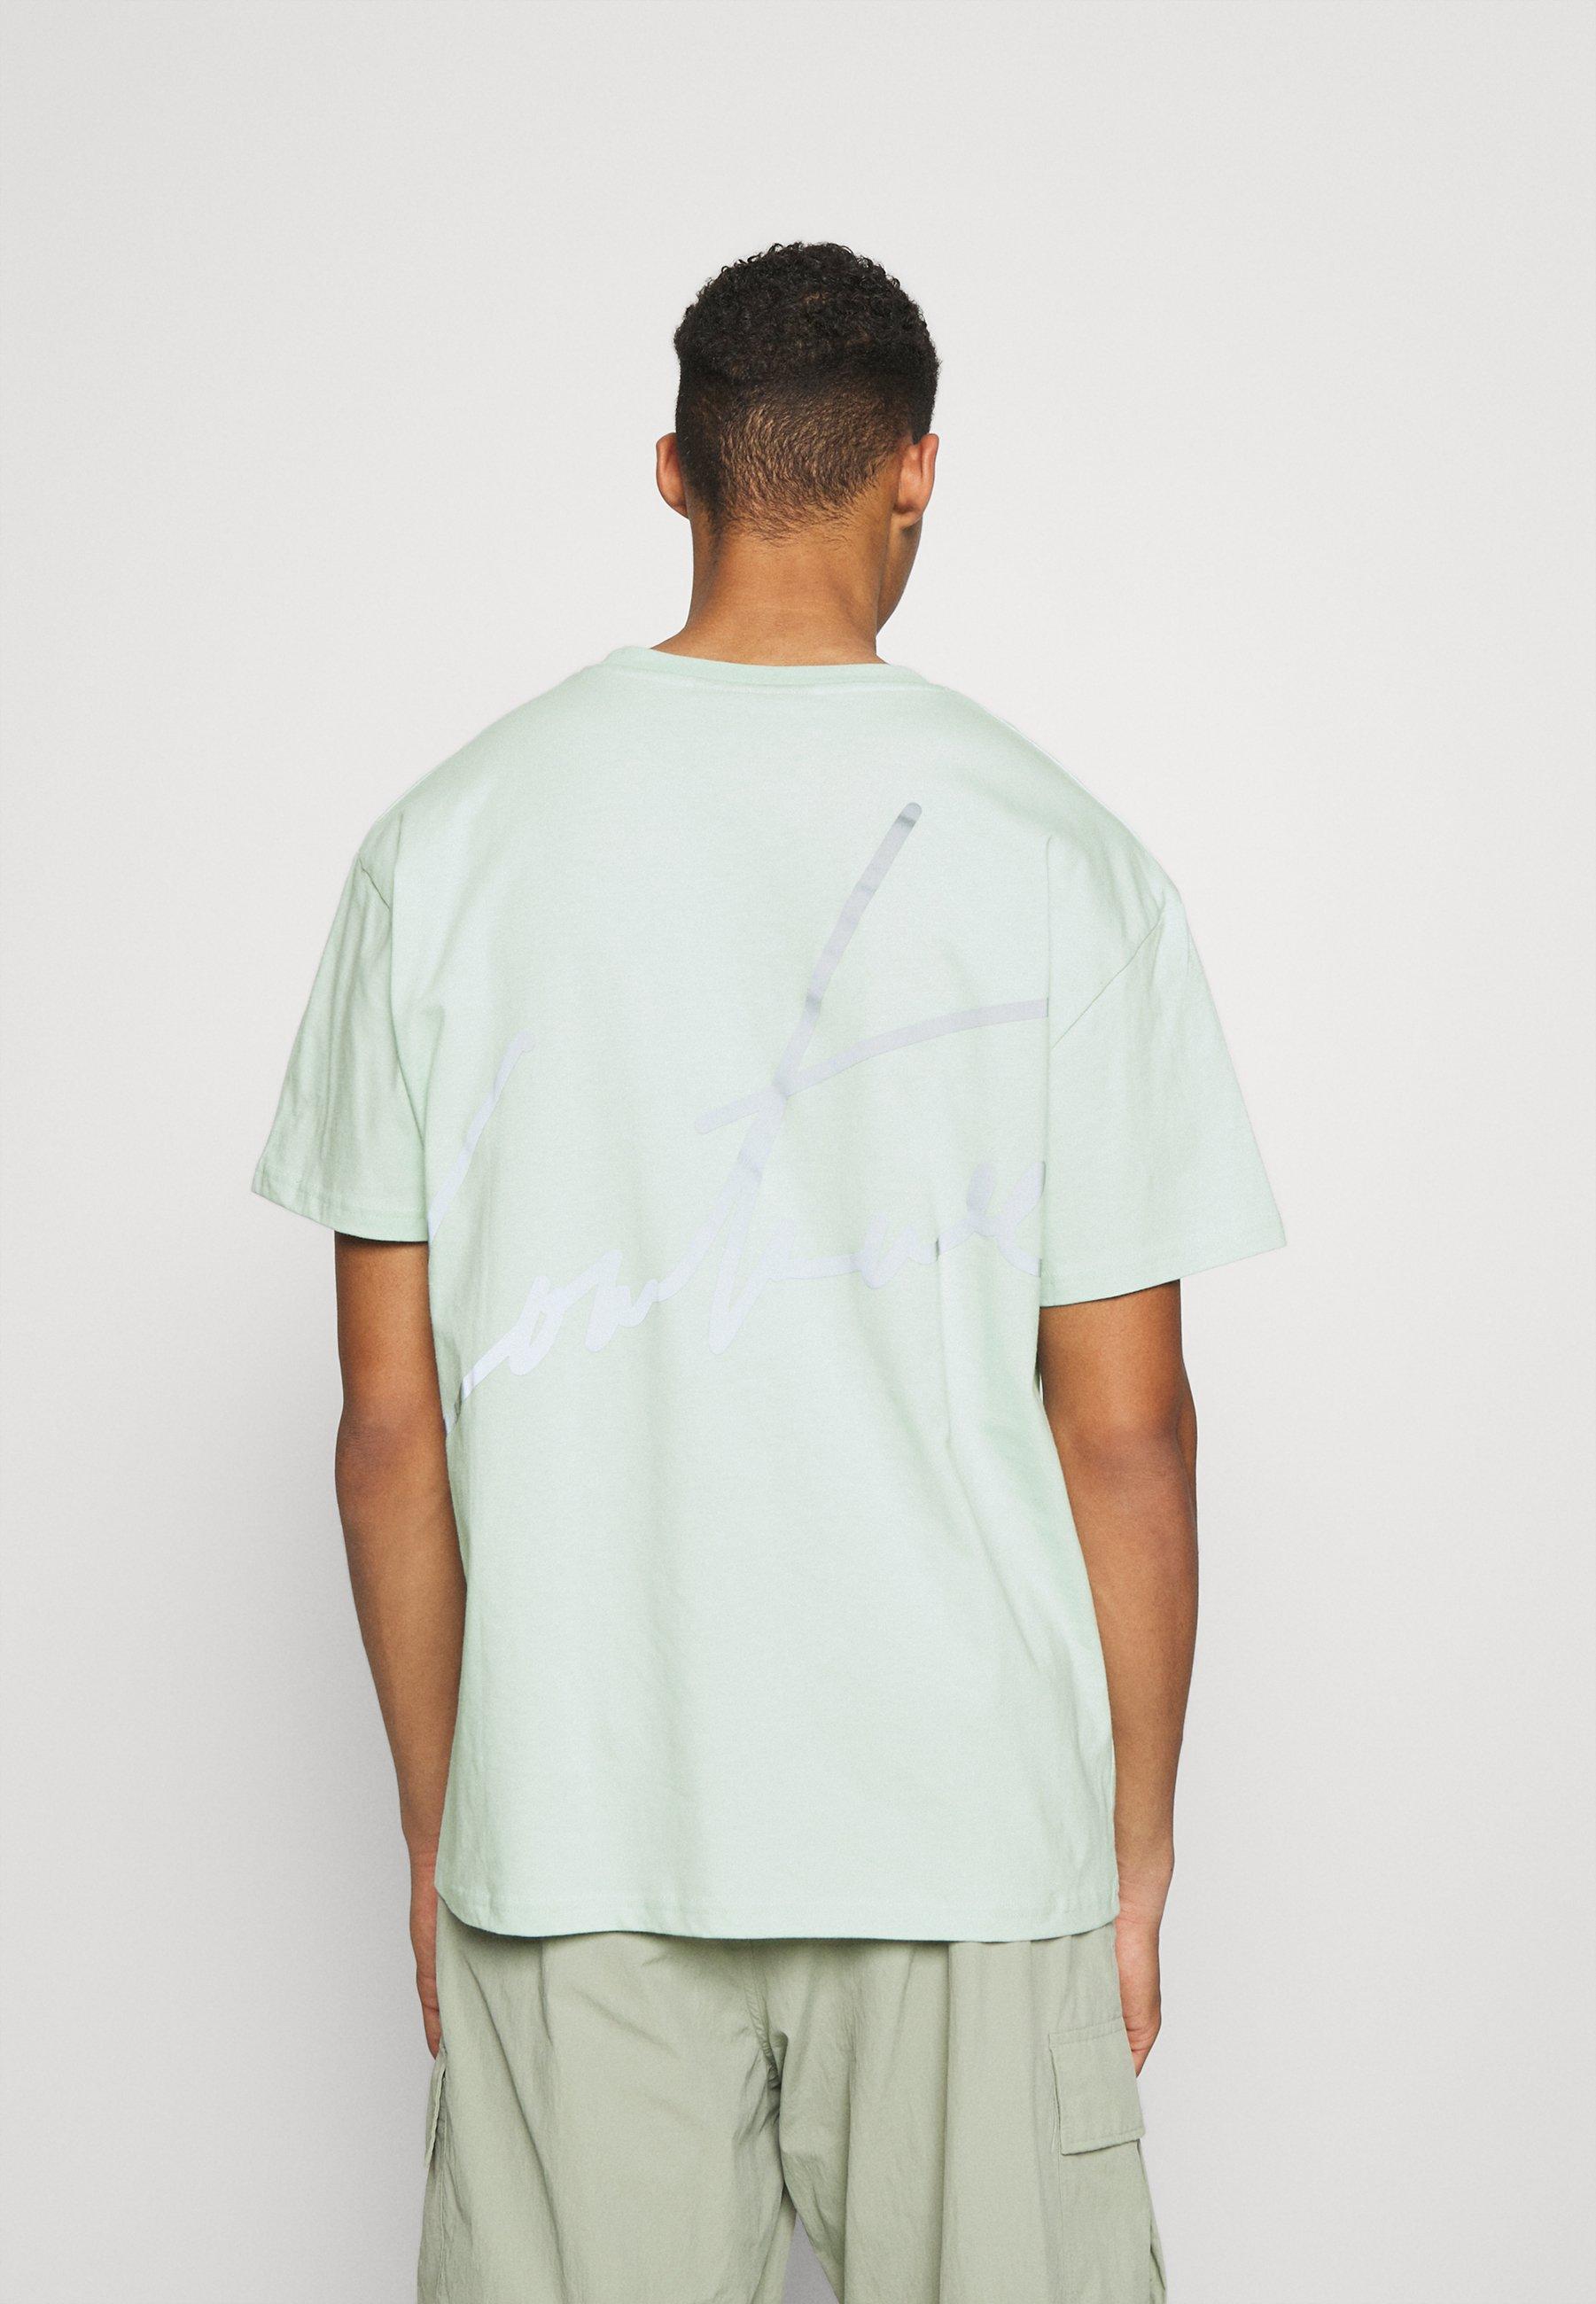 Homme RELAXED FIT REFLECTIVE T-SHIRT - T-shirt imprimé